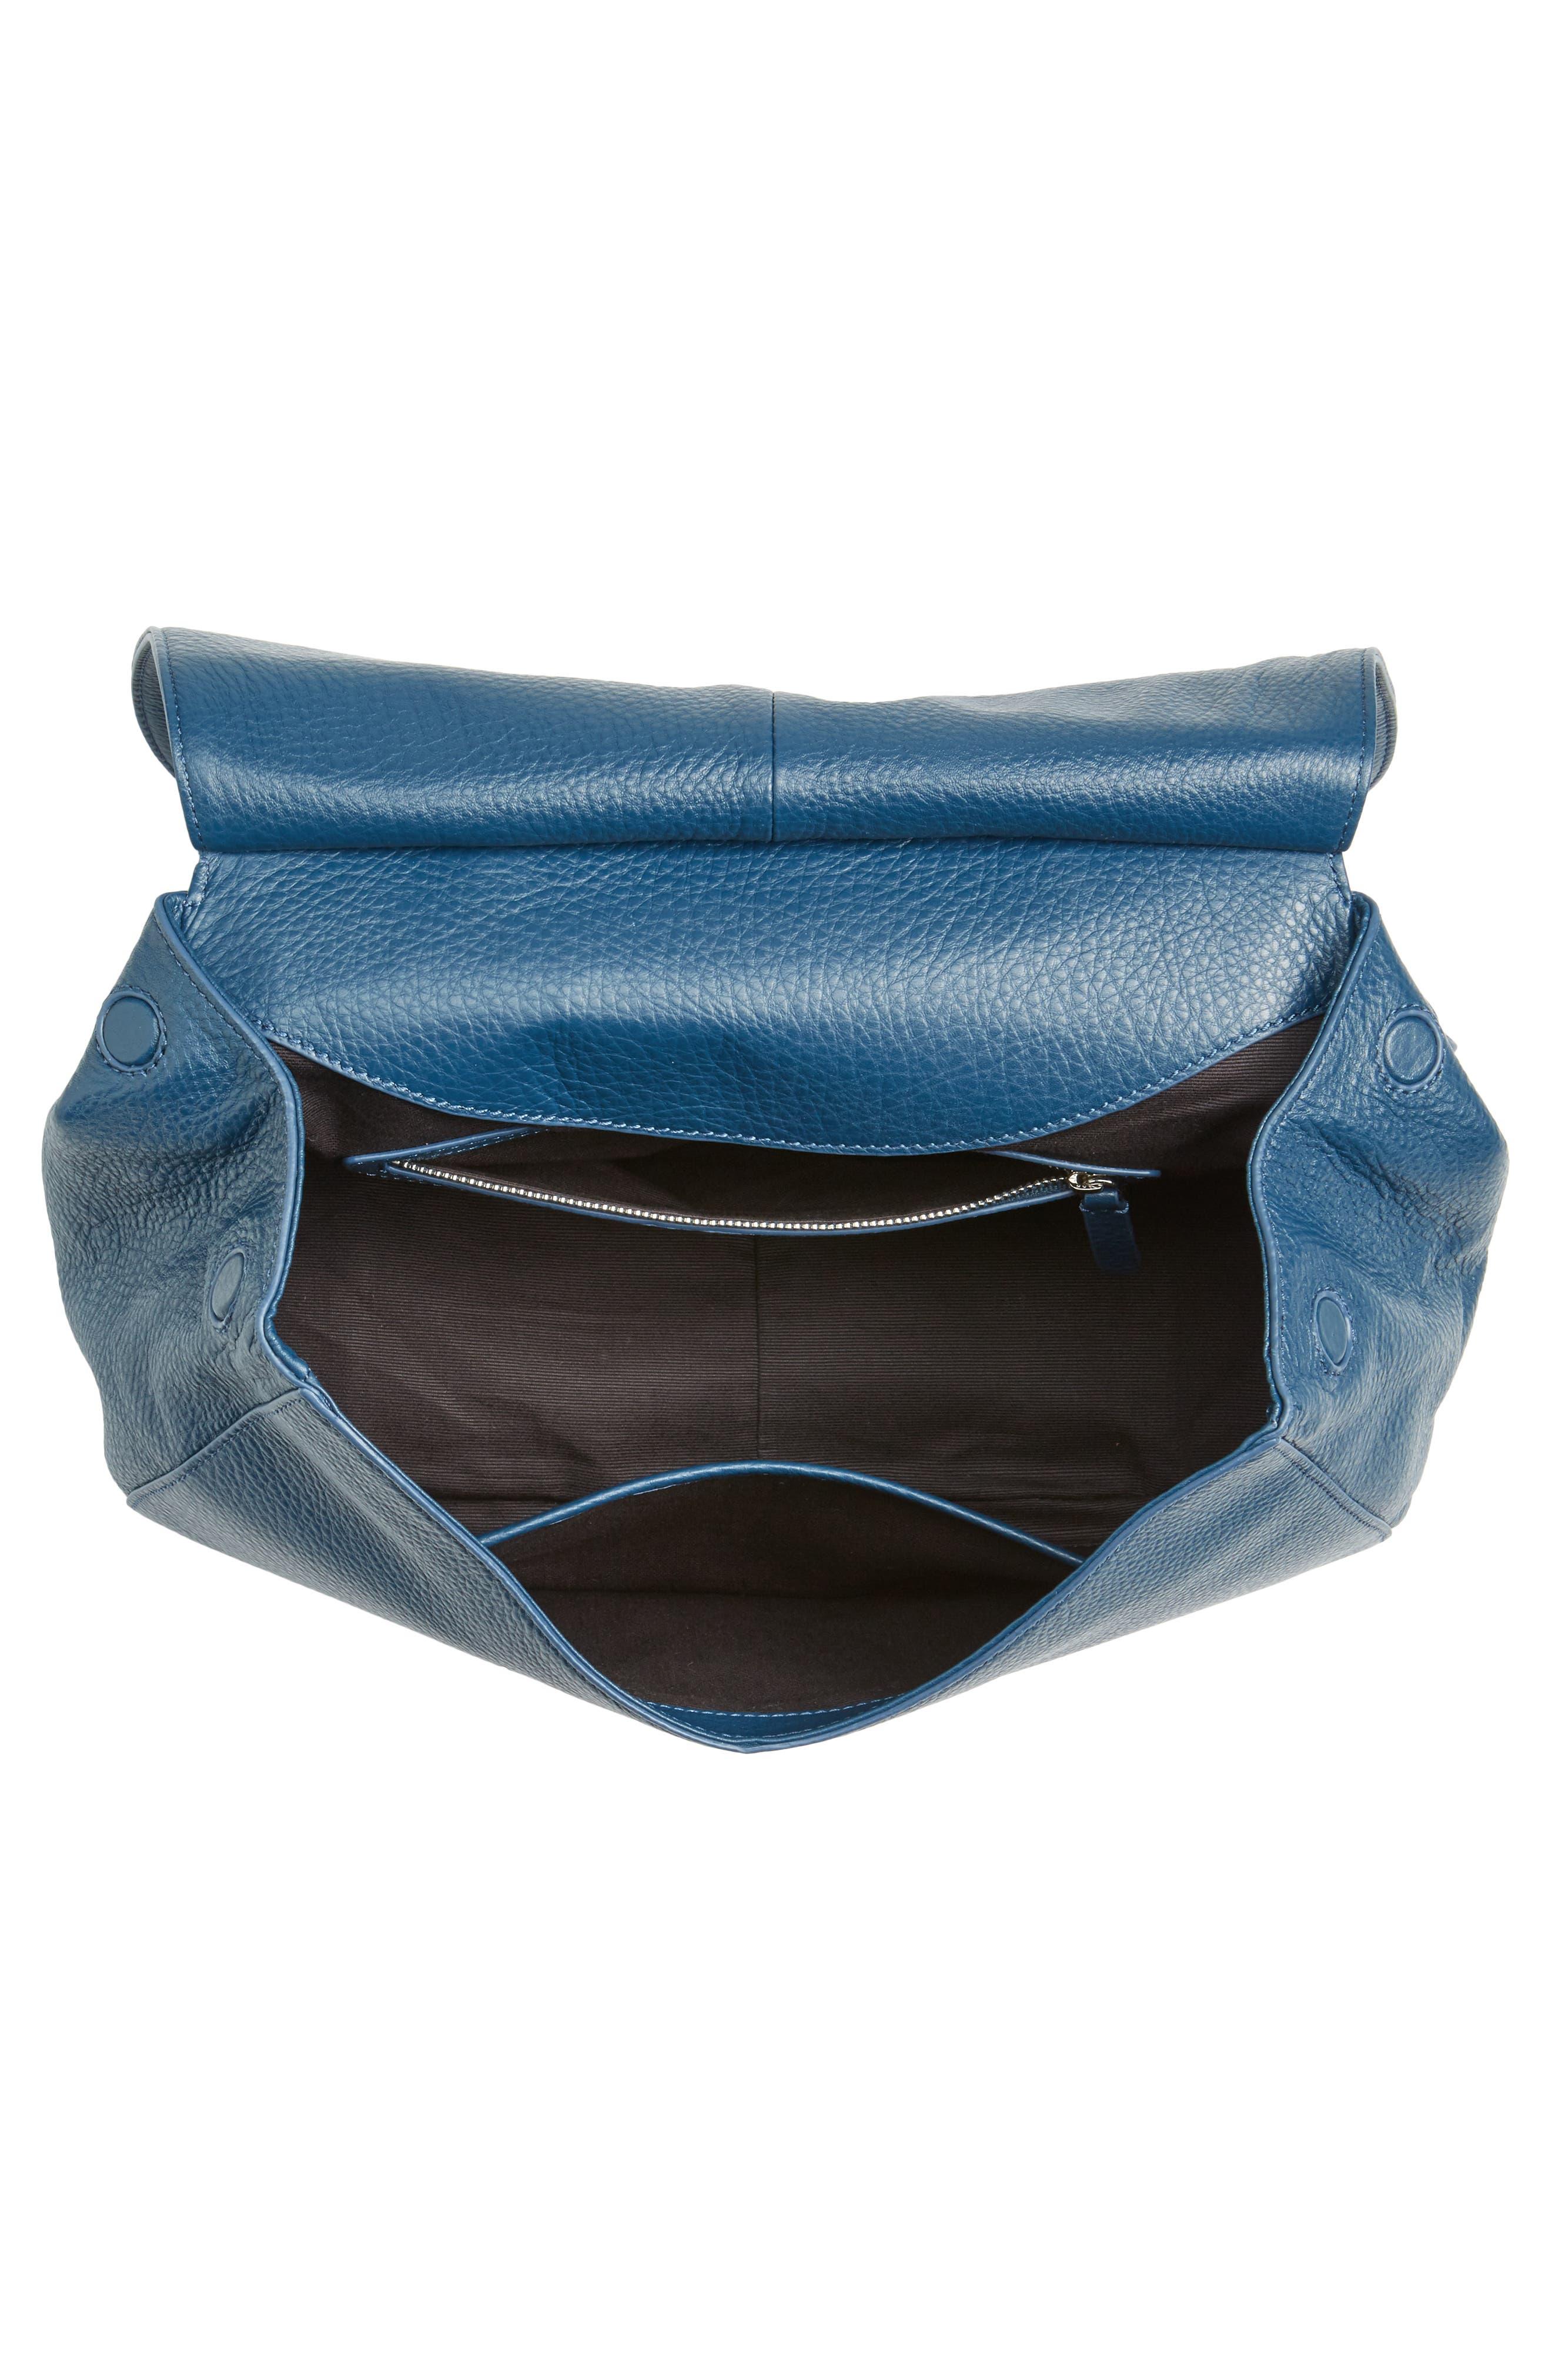 Kate Calfskin Leather Top Handle Satchel,                             Alternate thumbnail 4, color,                             Navy